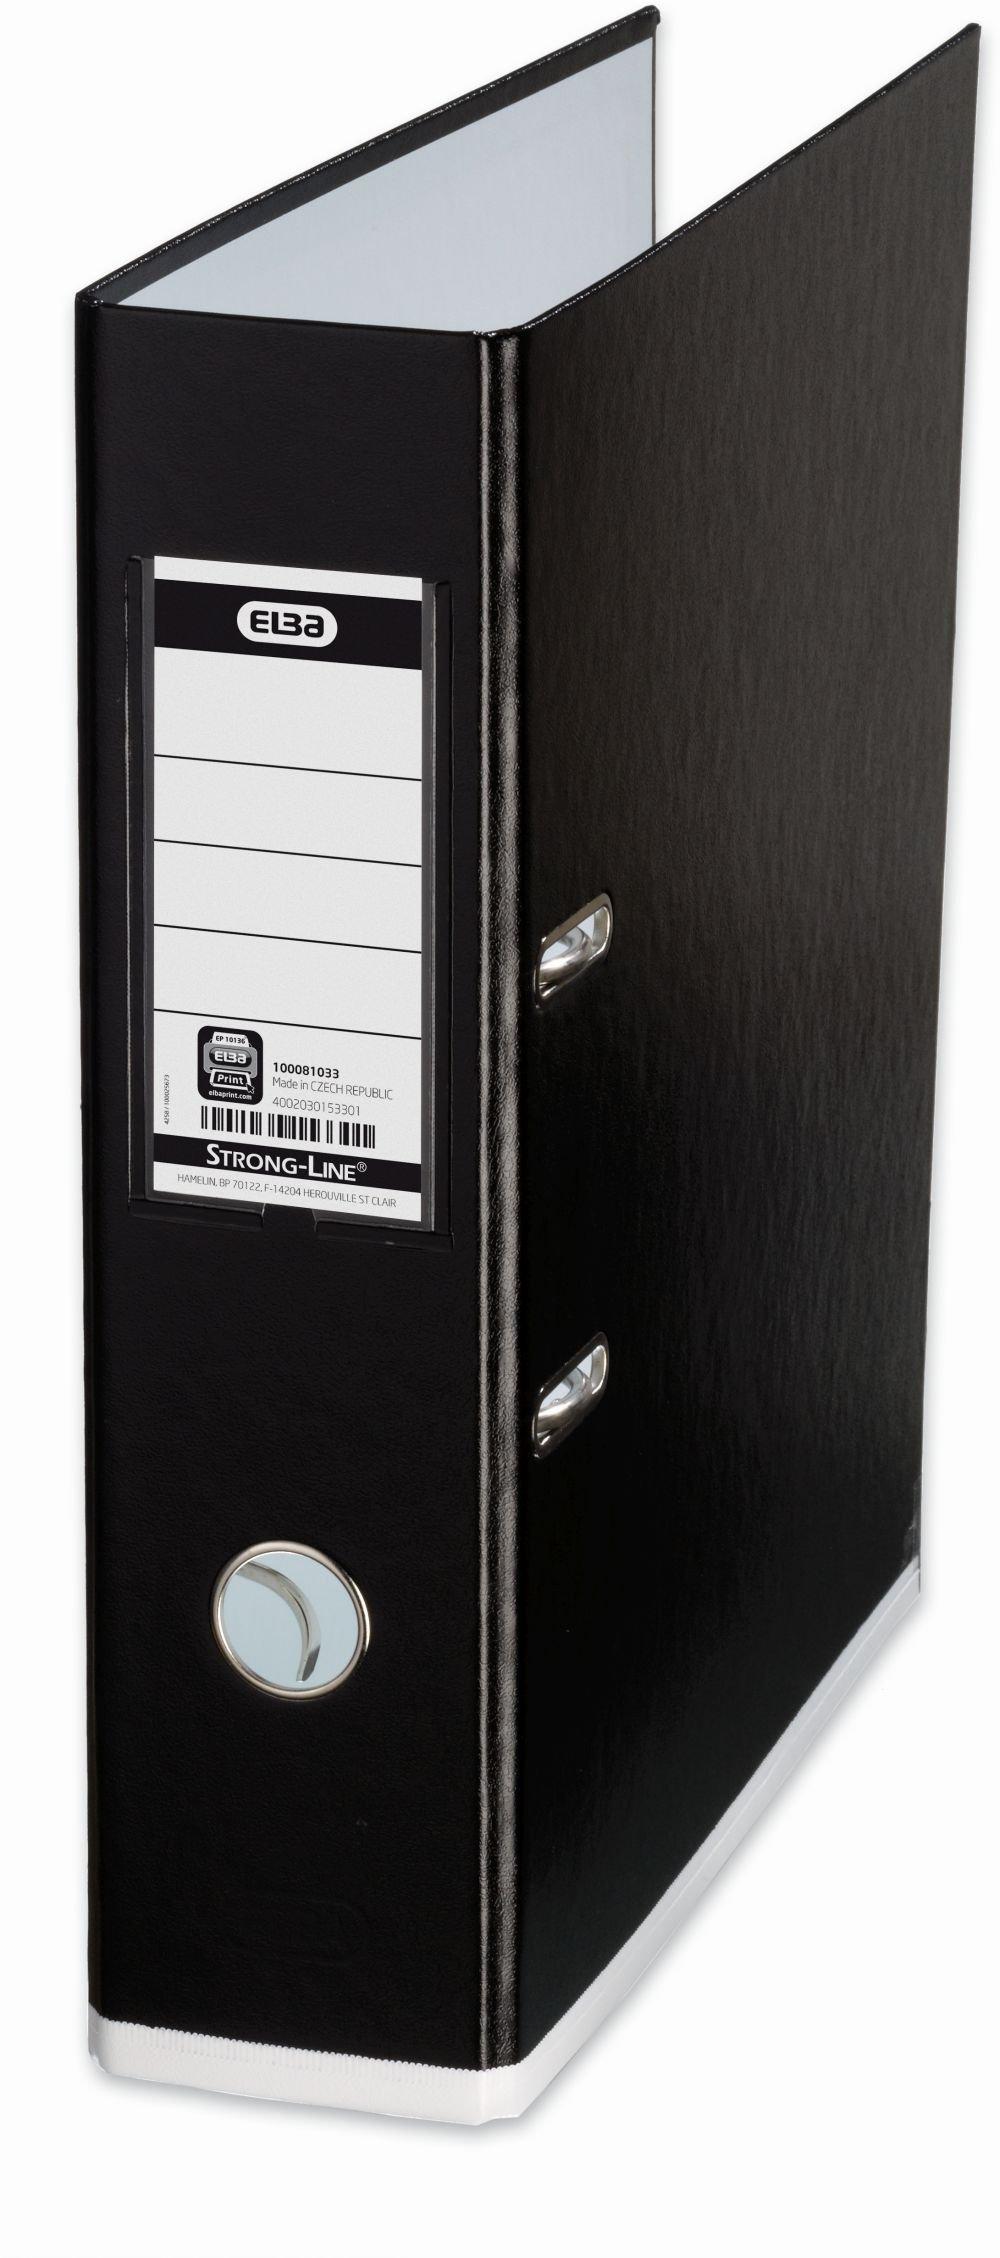 Elba MyColour Lever Arch File Polypropylene Capacity 80mm A4 Black and White Ref E104890901